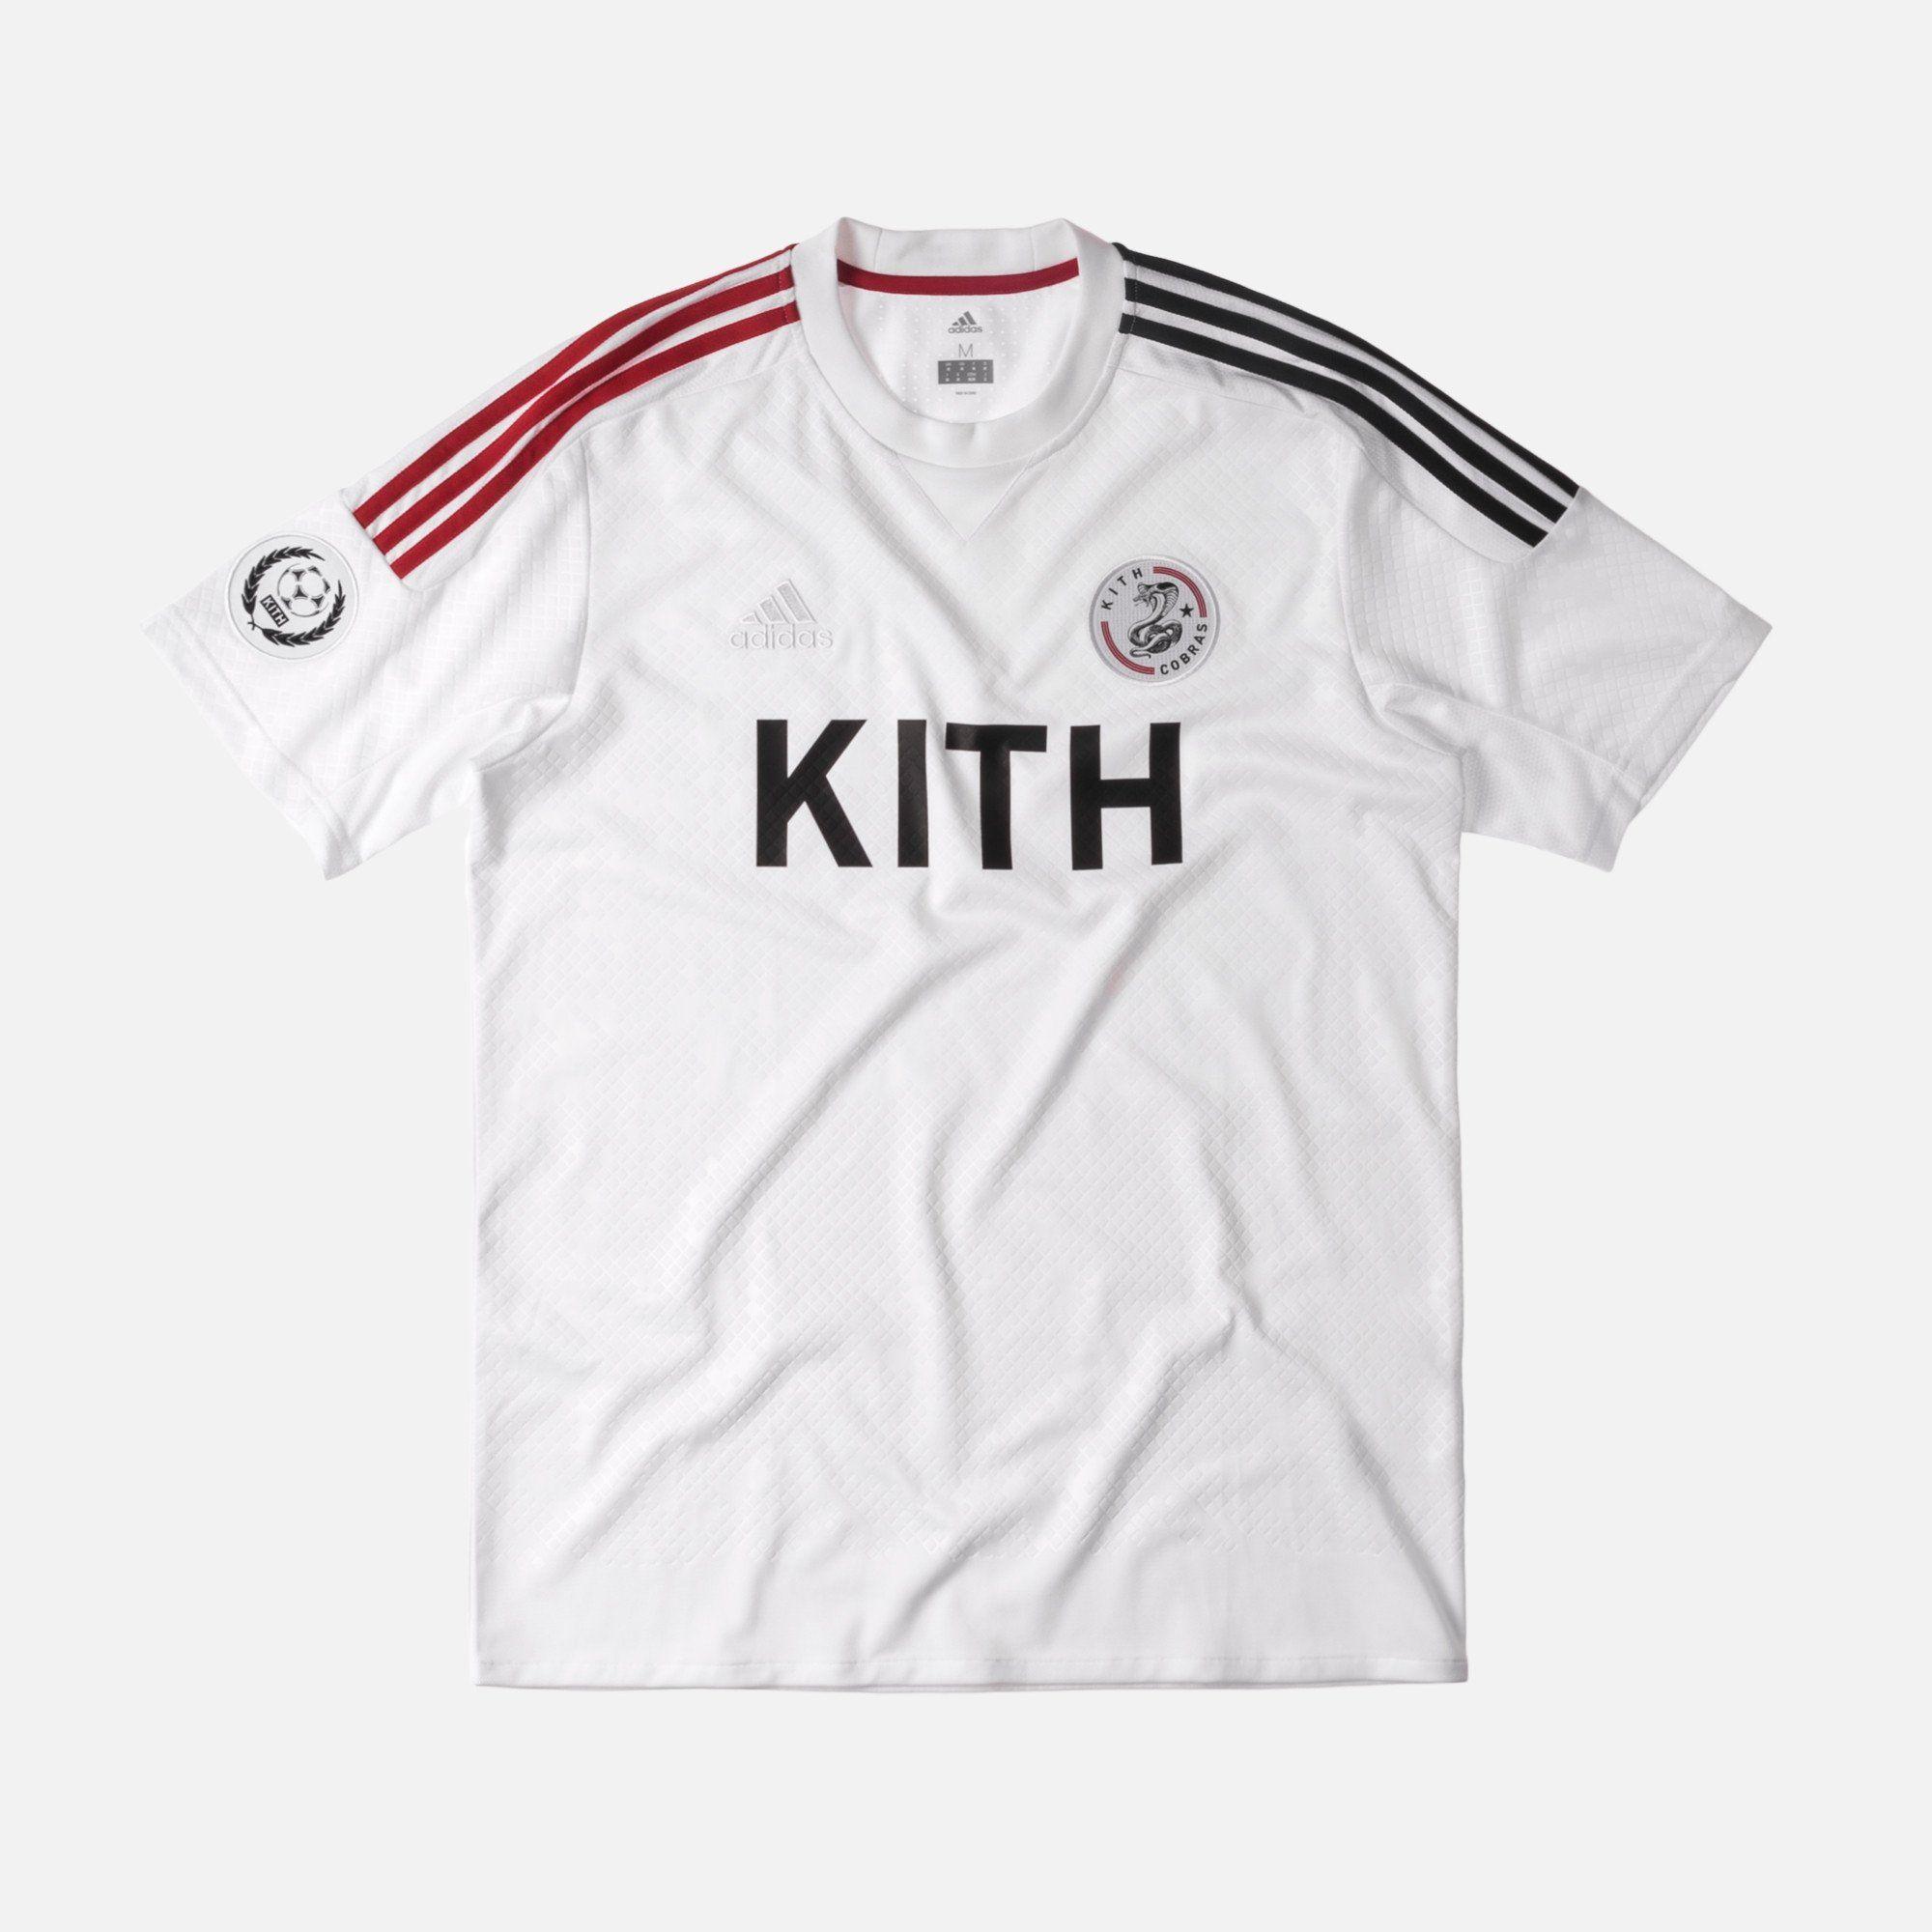 72e362ccf Kith x adidas Soccer Game Jersey - Cobras Home | Clothes | Pinterest ...